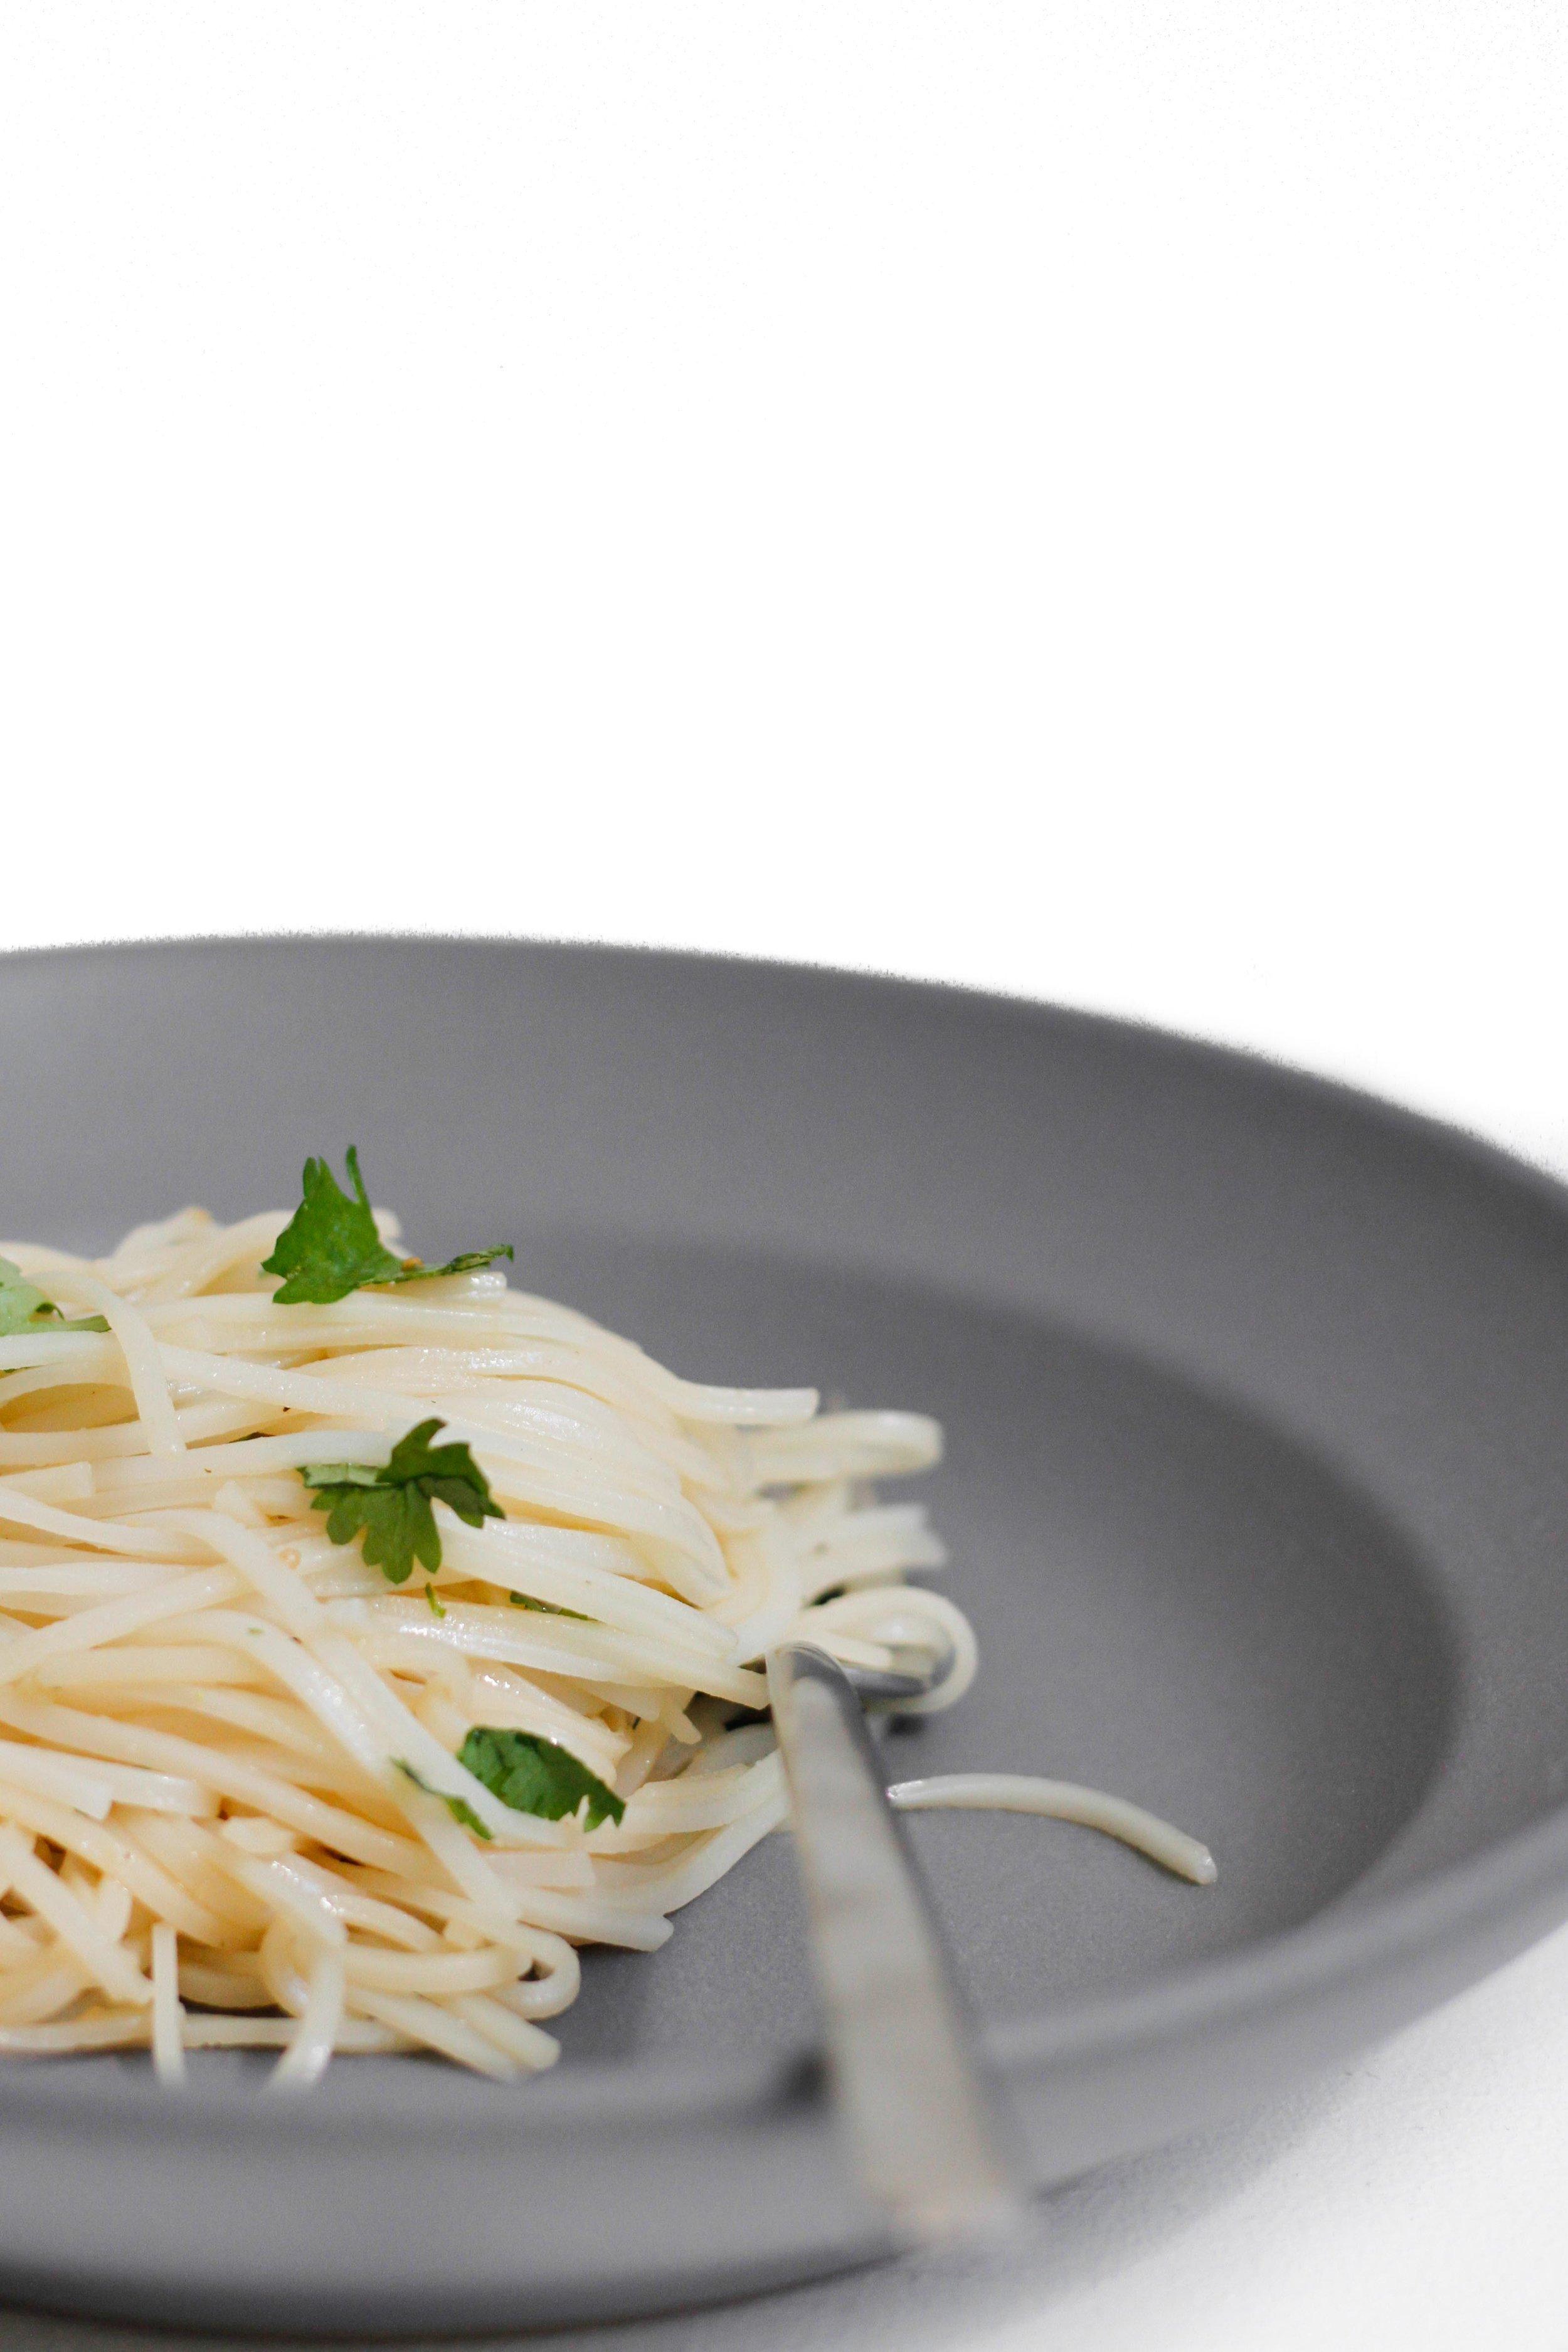 Cilantro and sesame rice noodles